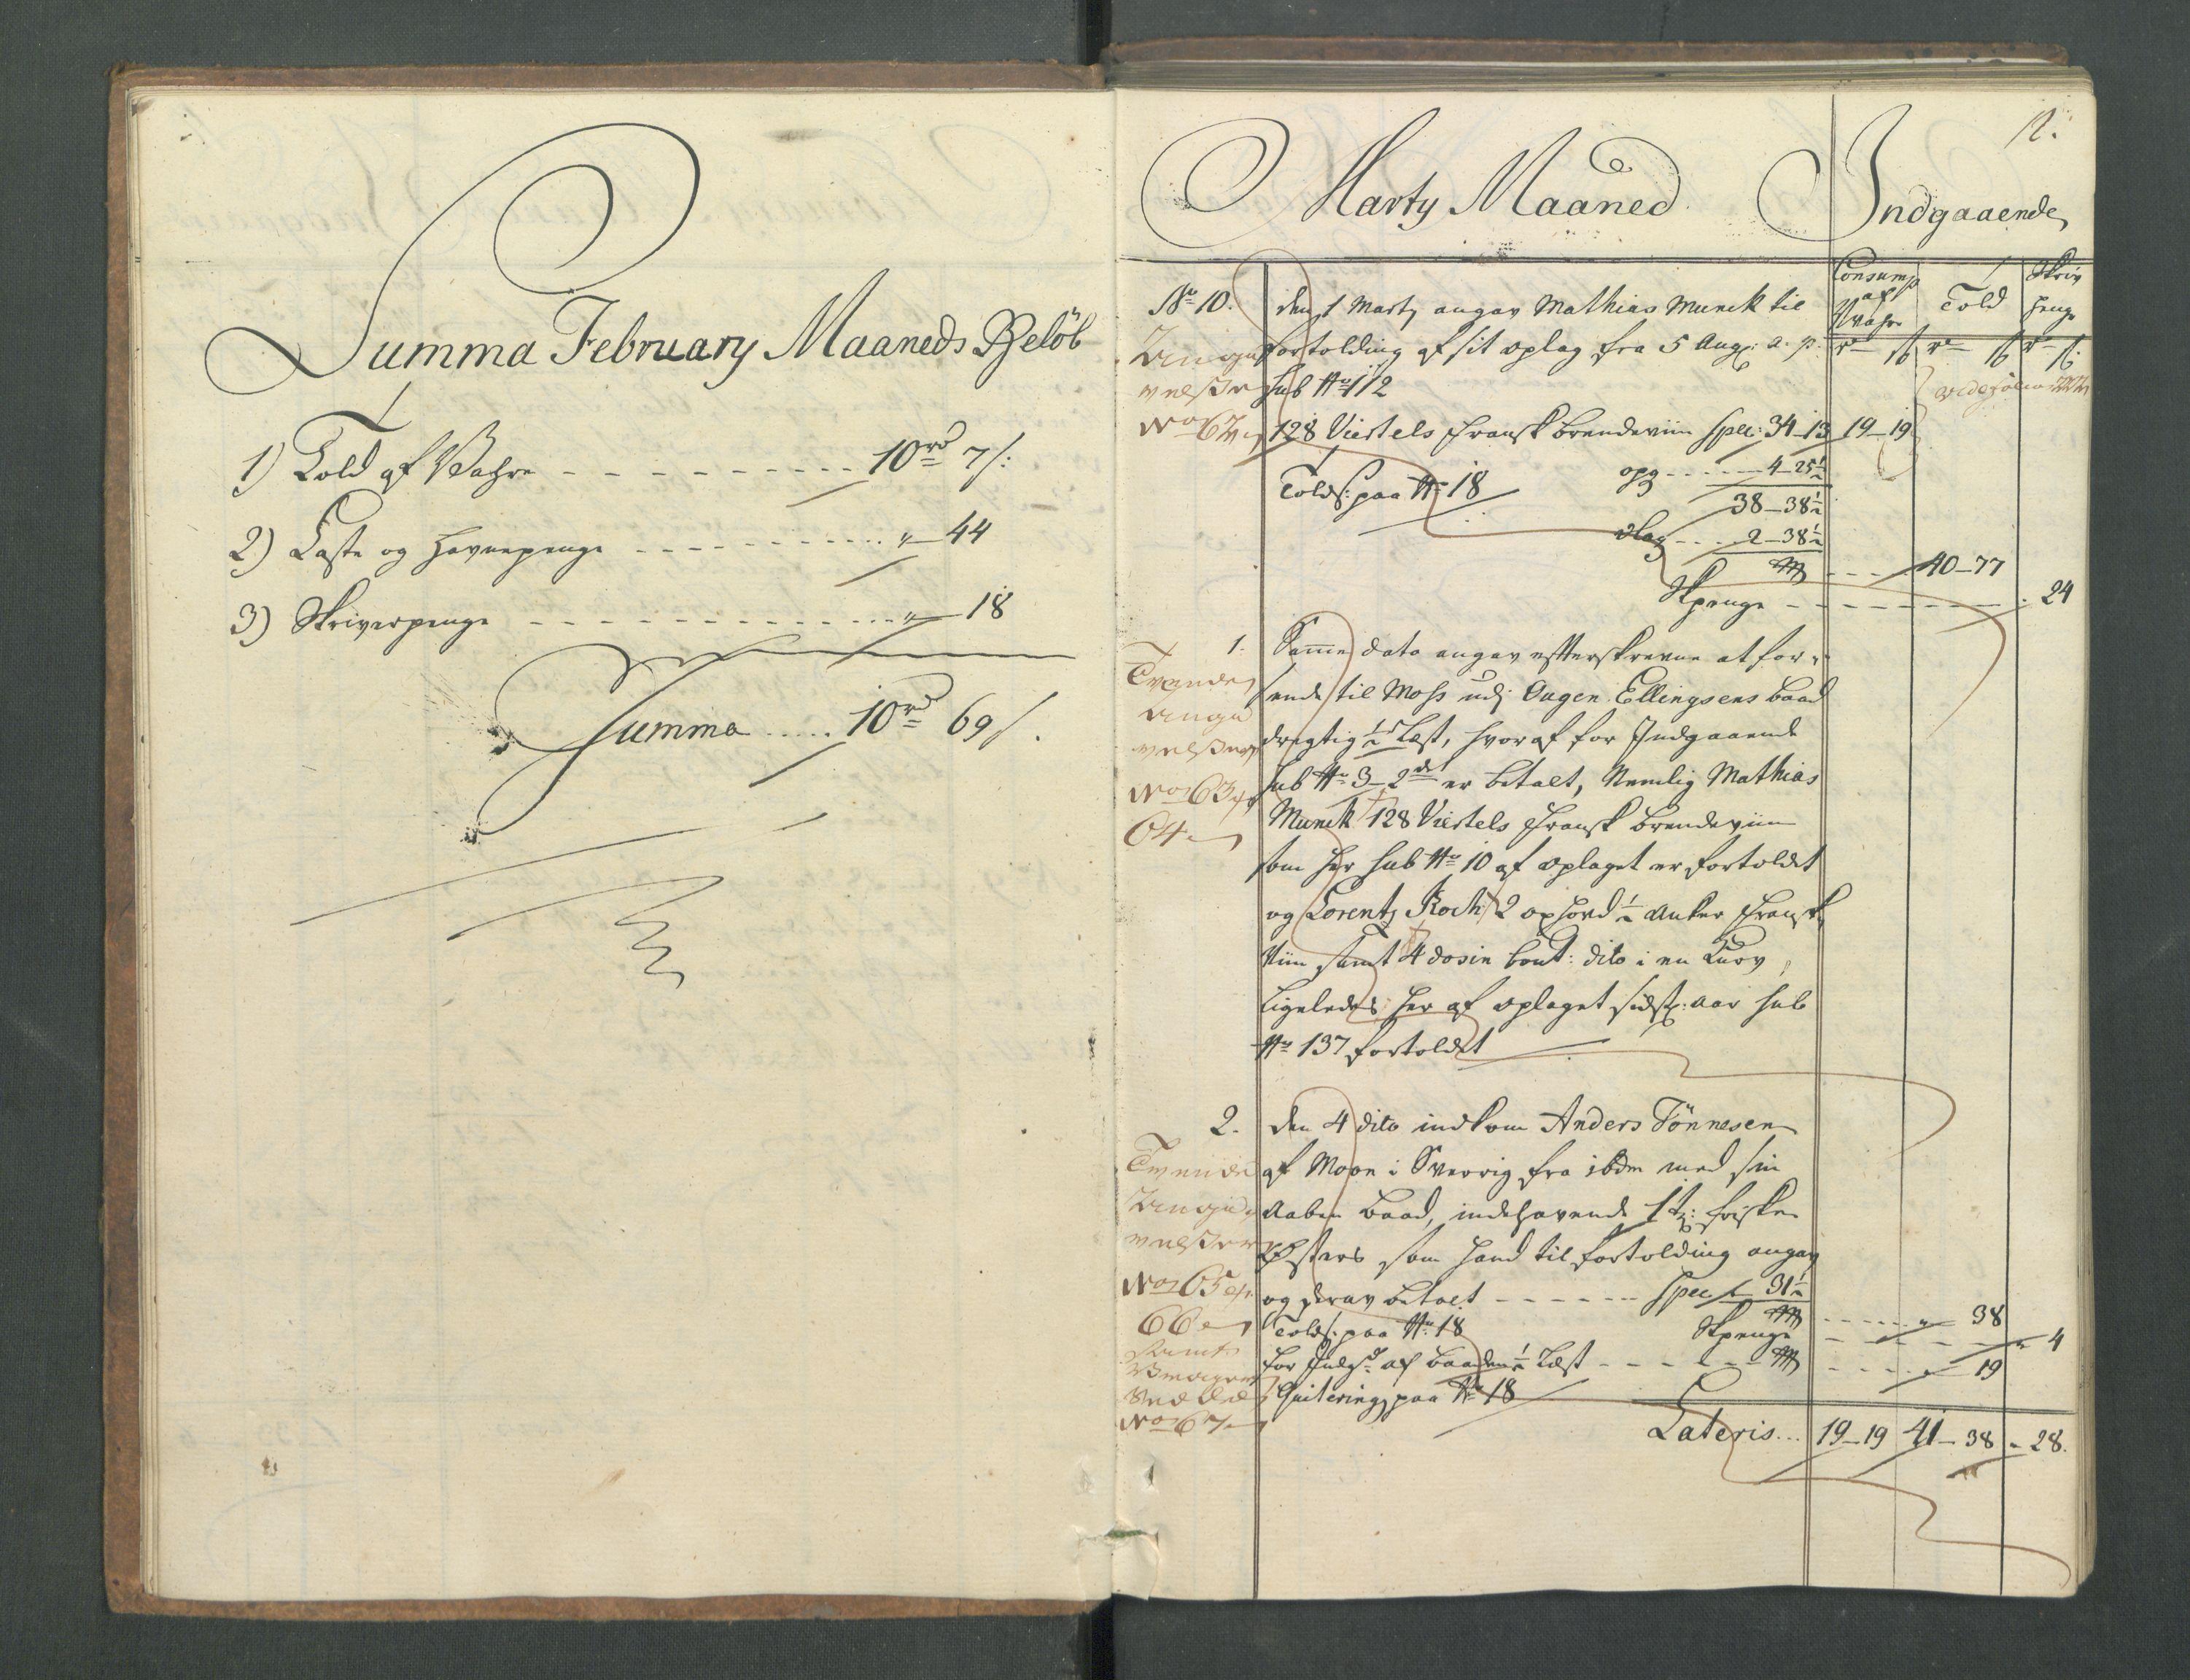 RA, Generaltollkammeret, tollregnskaper, R02/L0022: Tollregnskaper Fredrikstad, 1756, s. 11b-12a